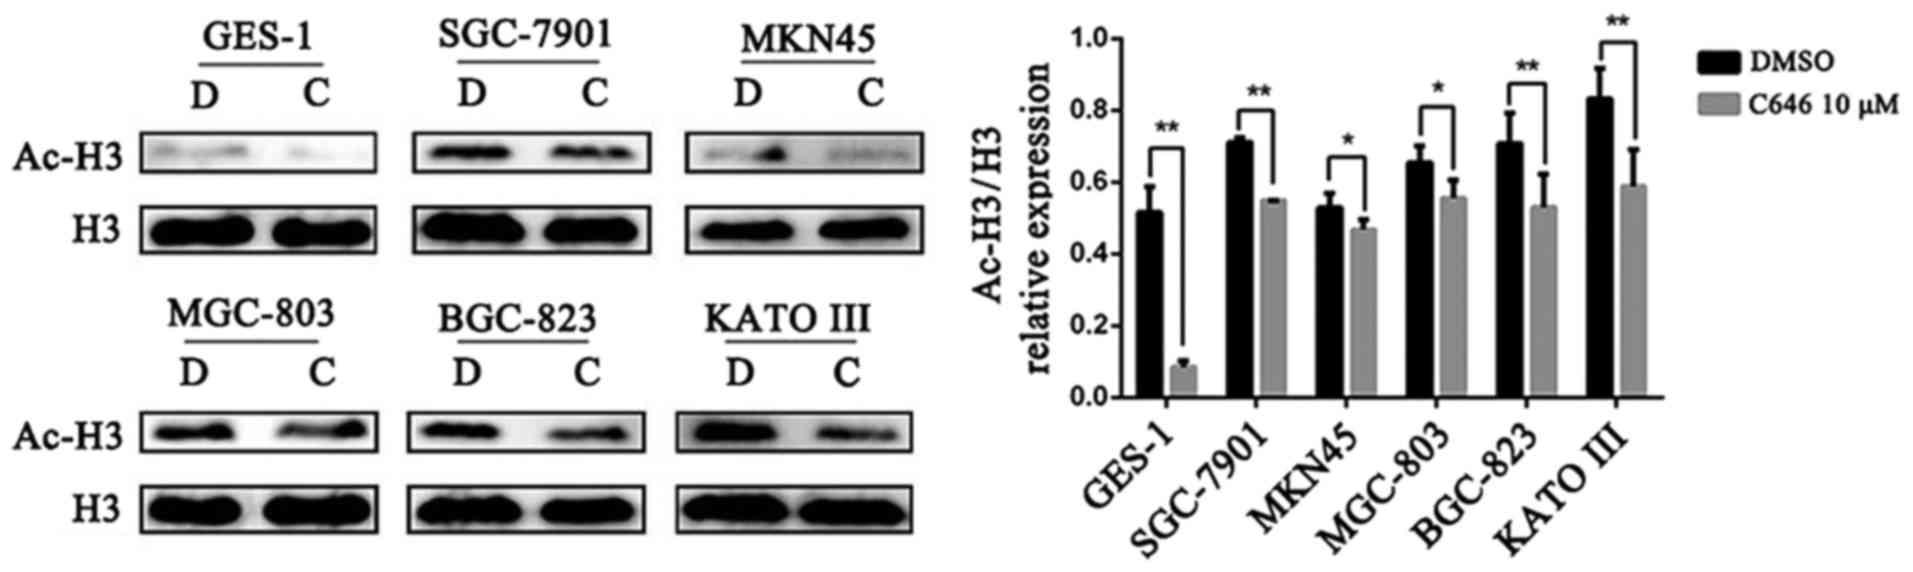 Histone acetyltransferase p300/CBP inhibitor C646 blocks the